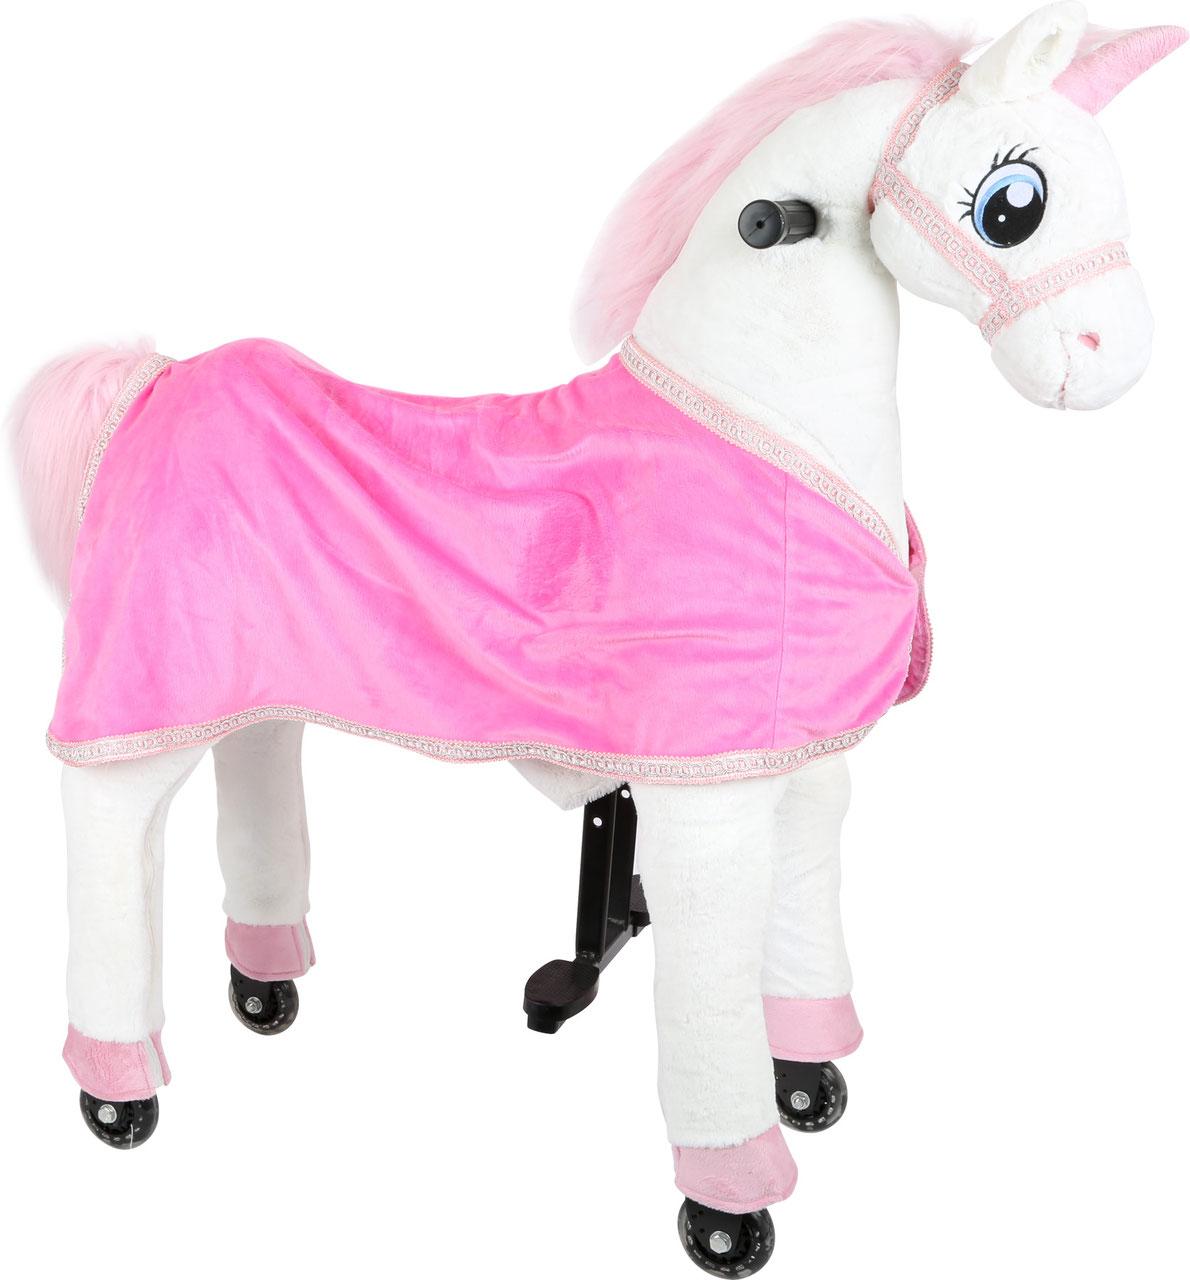 Rijpaard unicorn